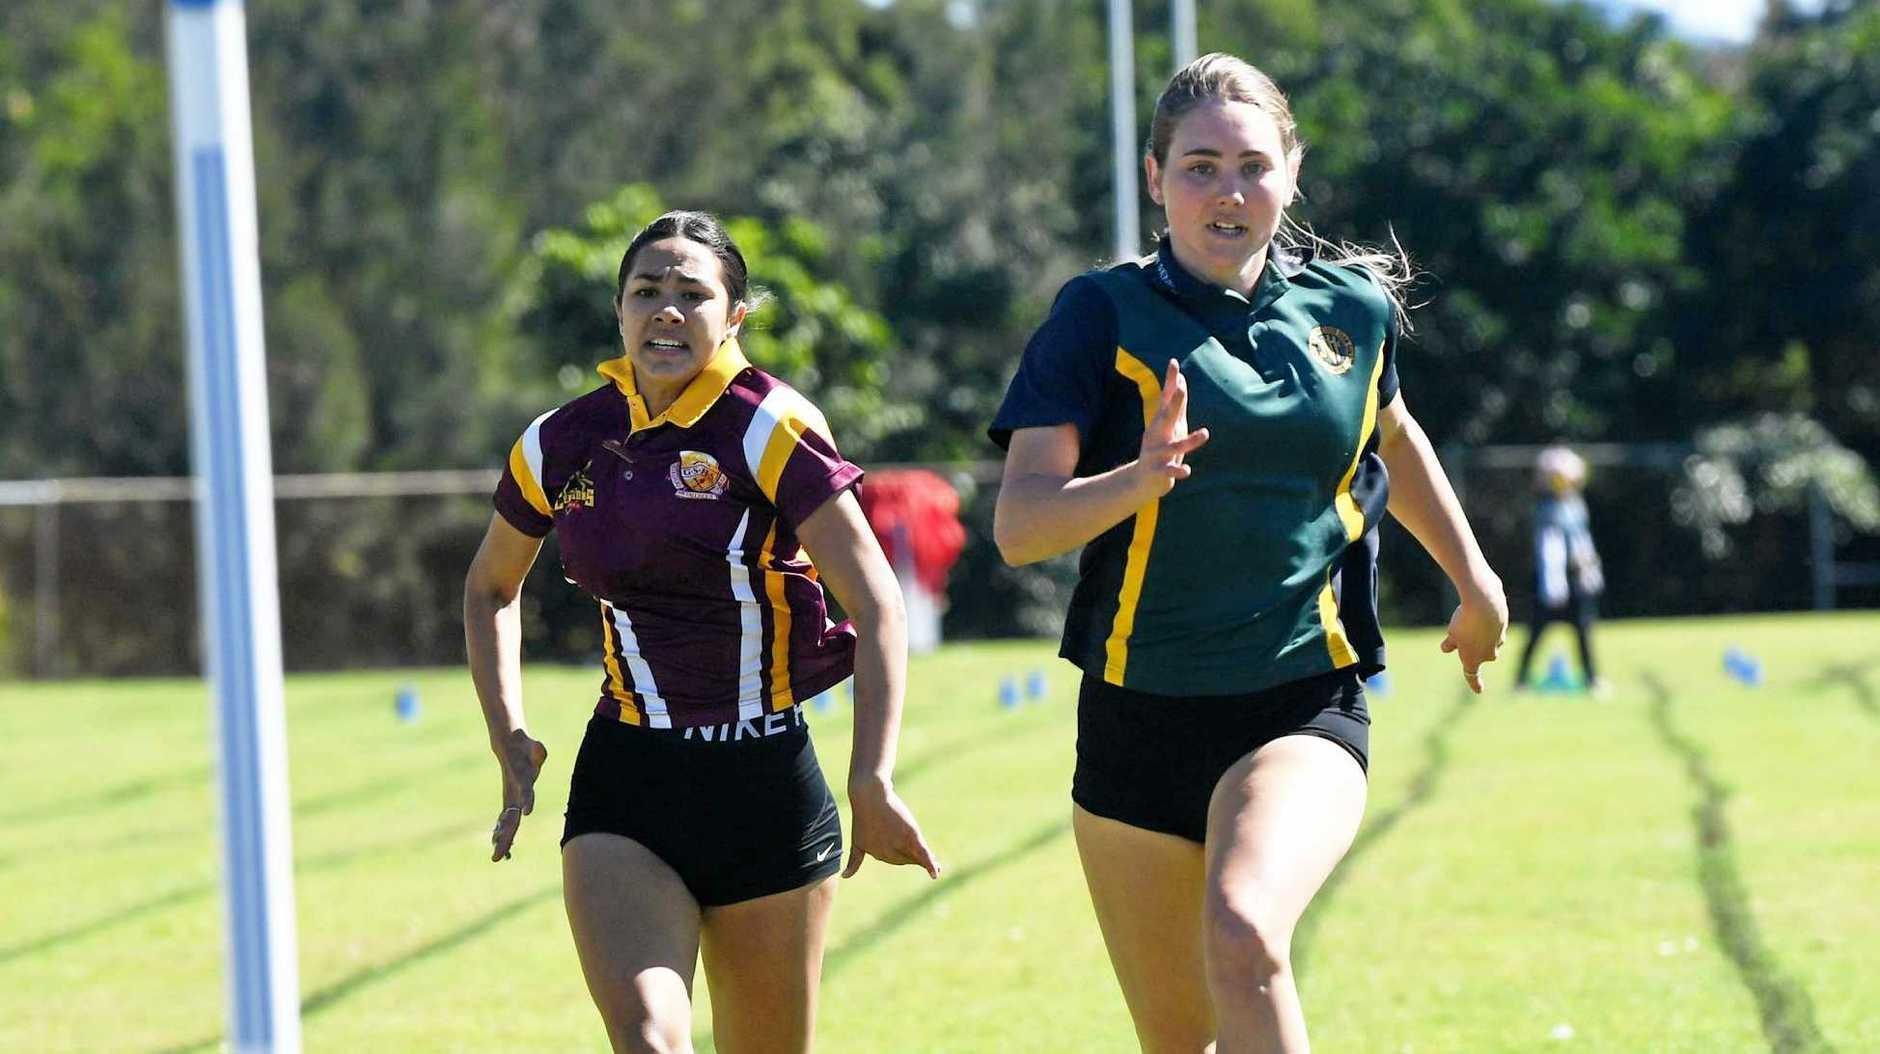 Gympie All Schools Athletics Carnival at Albert Park - Tannar Jenkins andAmelia Terare